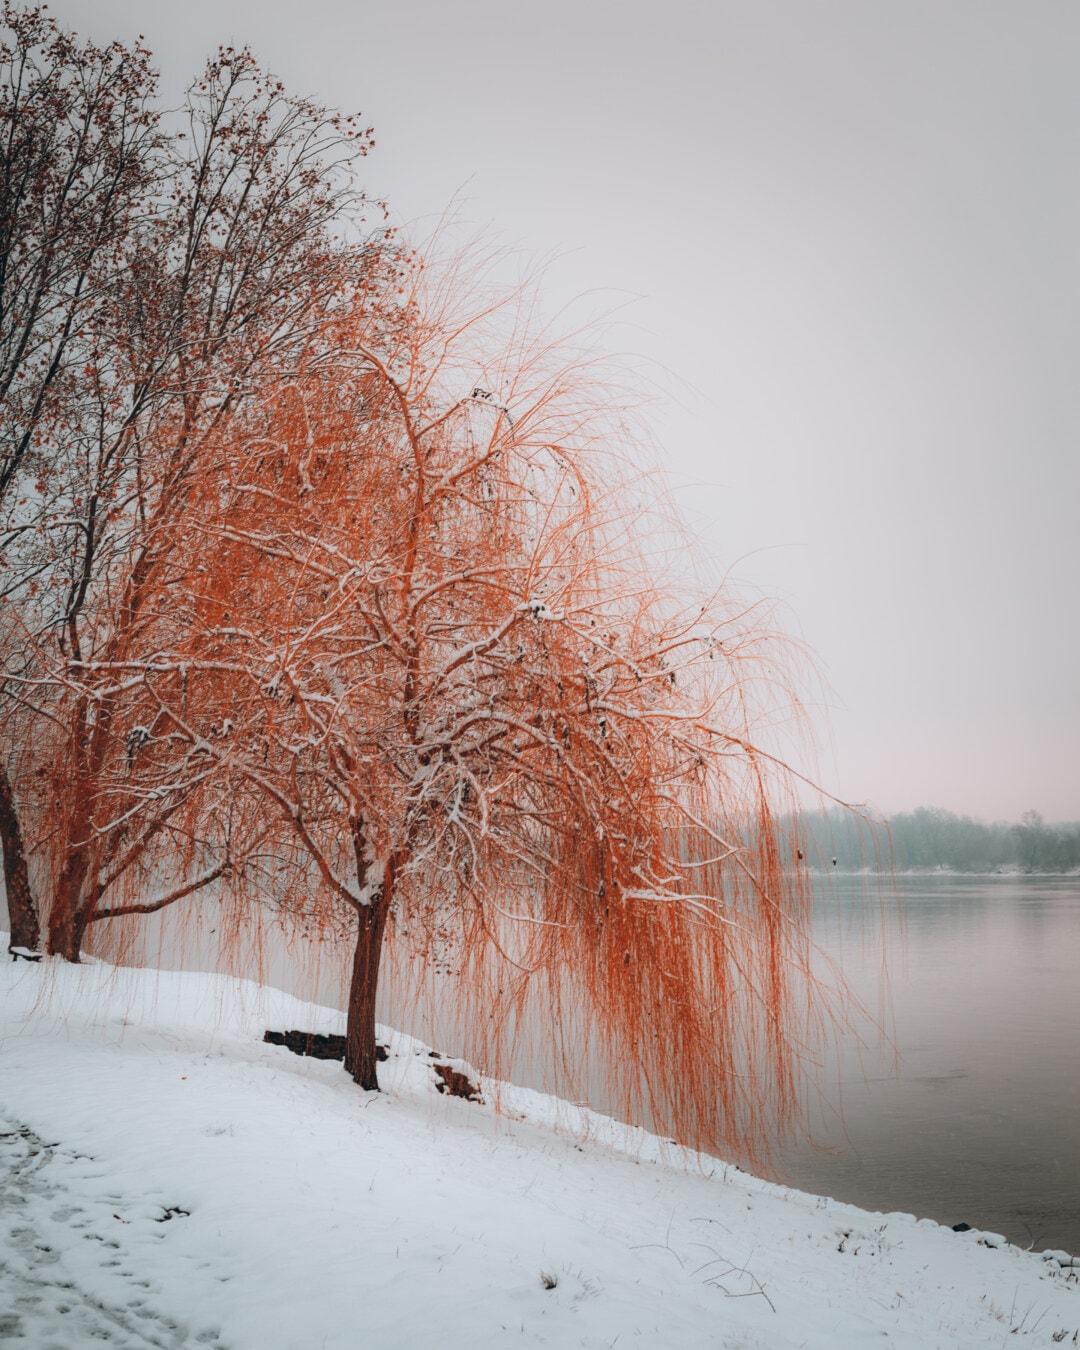 berge, neige, arbre, brumeux, matin, gel, brouillard, arbres, Hiver, saison